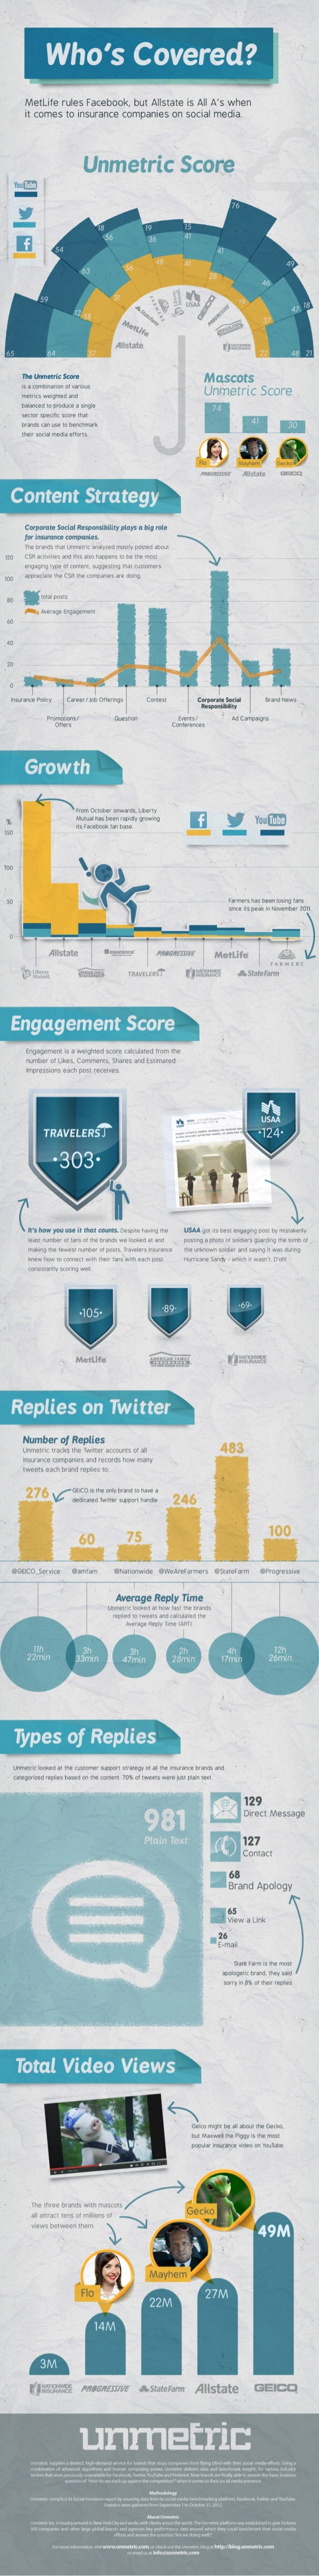 Top Performing Insurance Brands on Social Media